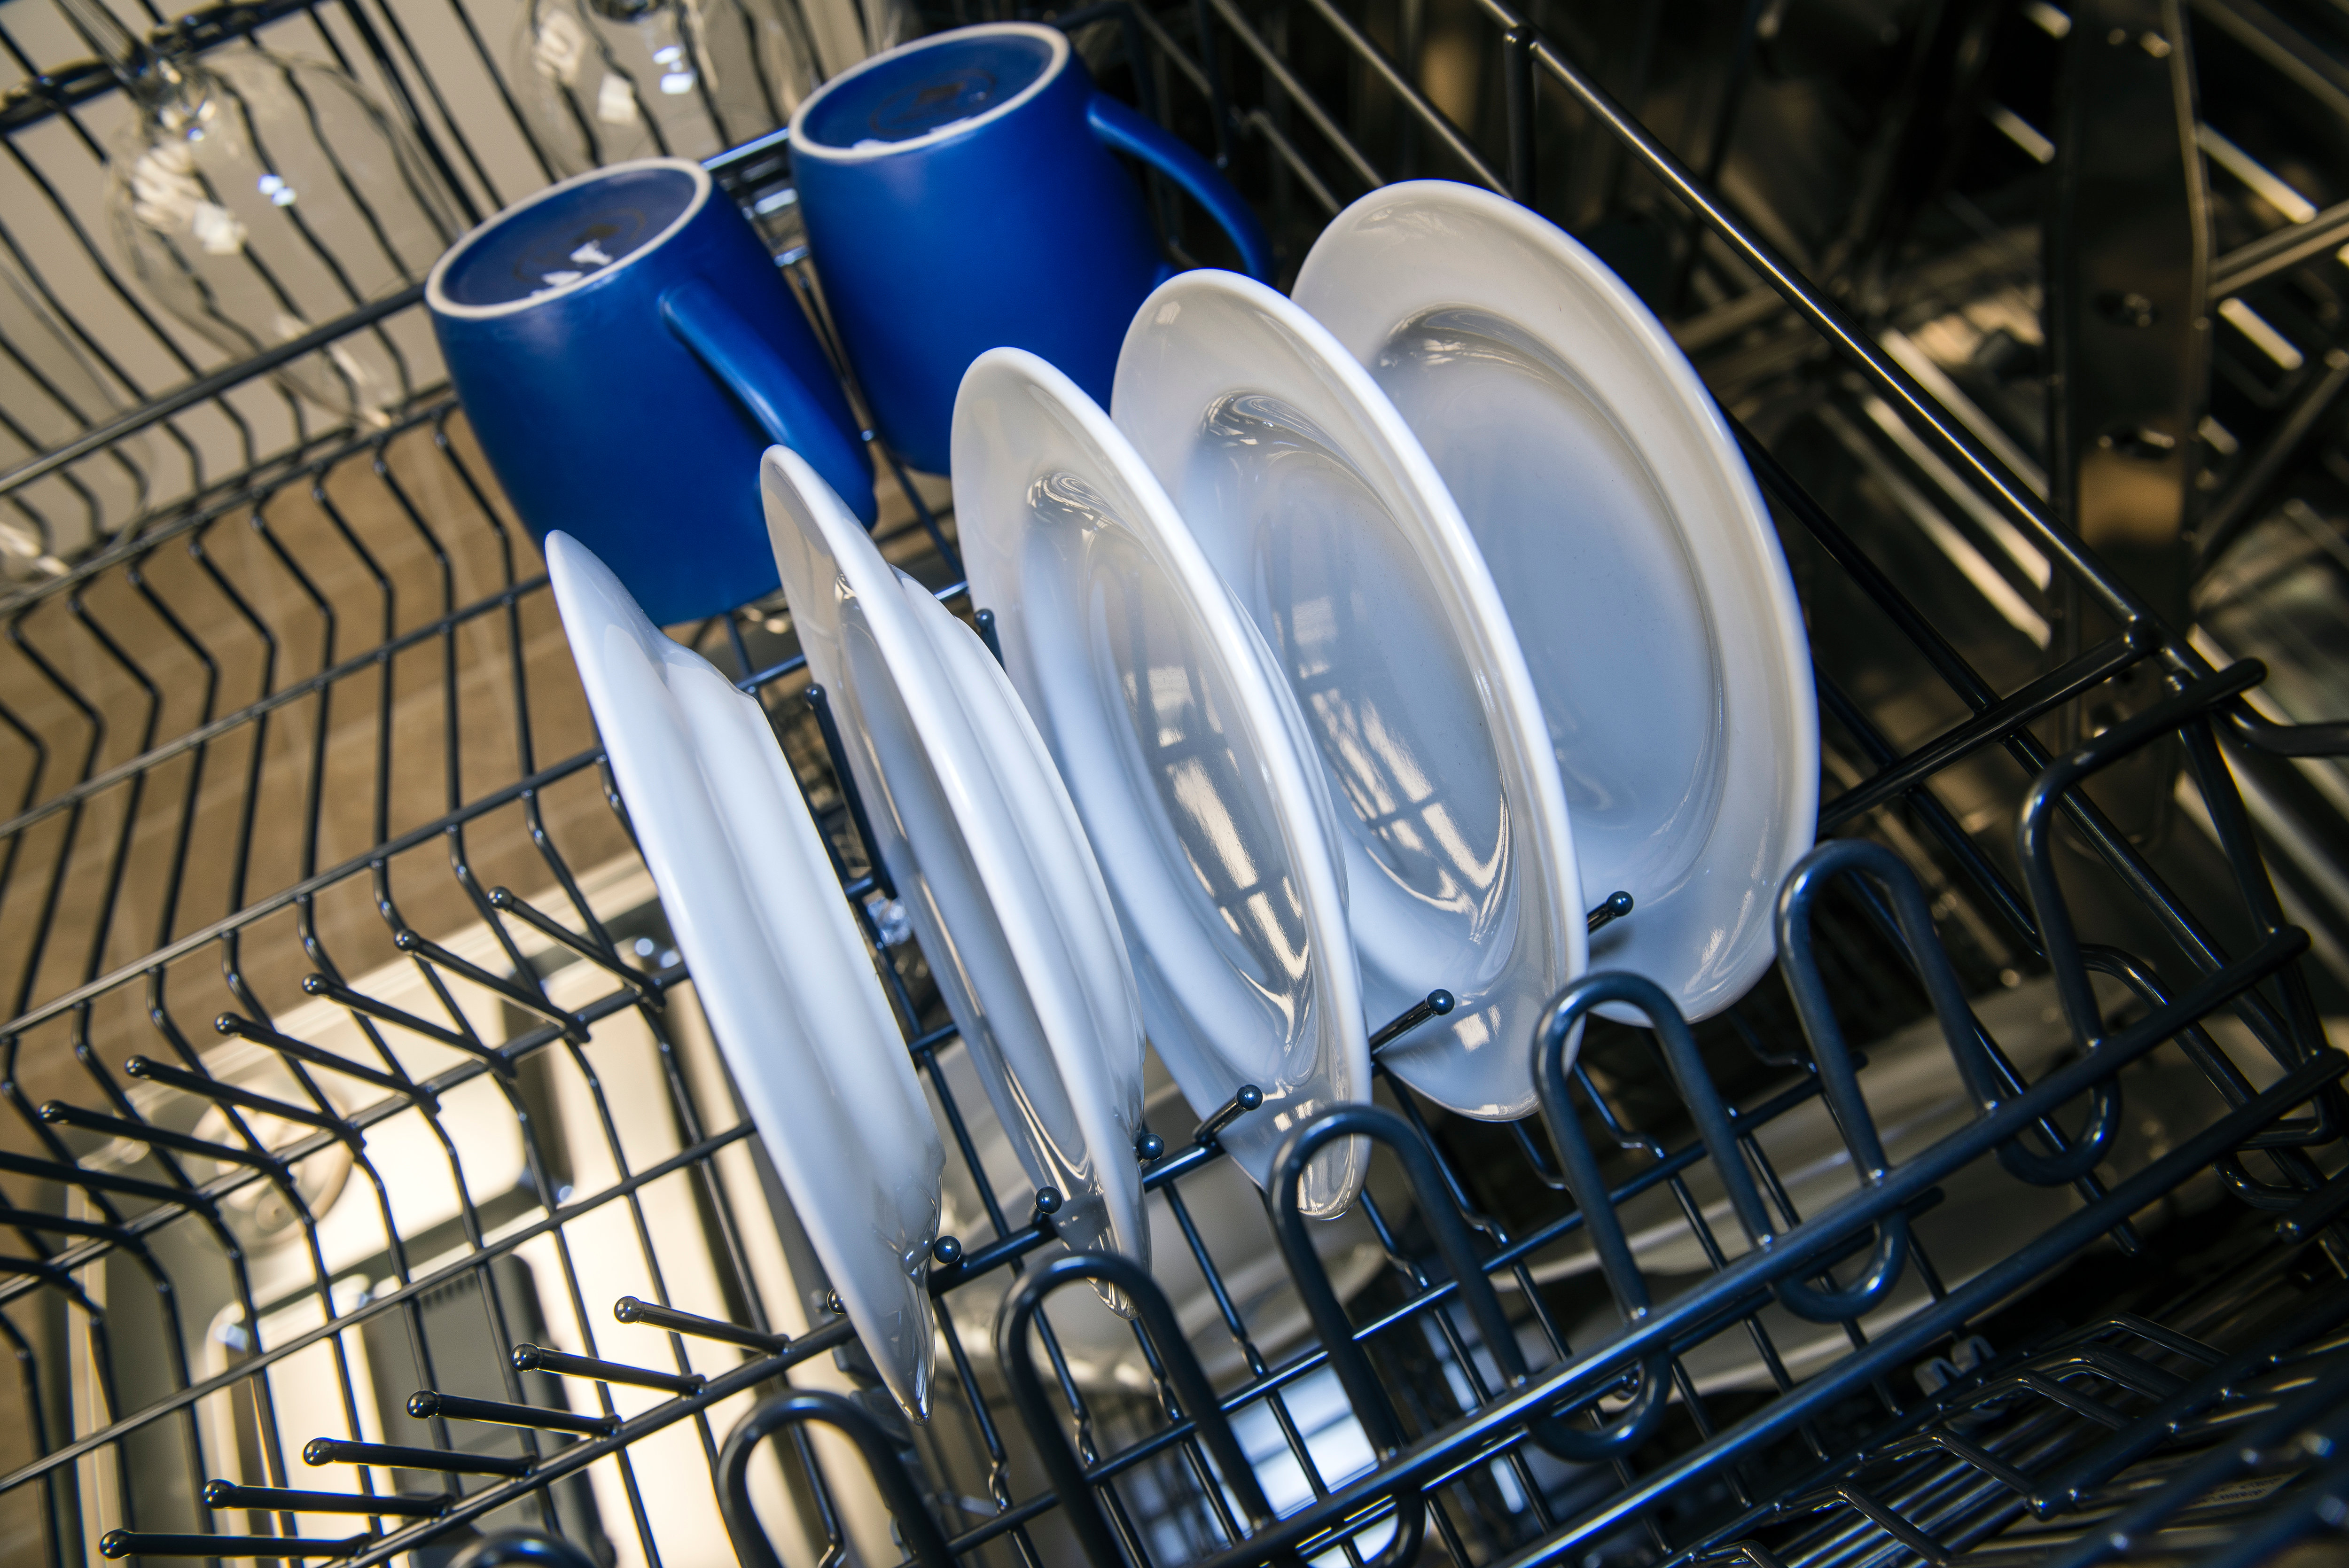 Asko D5534XXLFI upper rack cup shelves and stemware holders